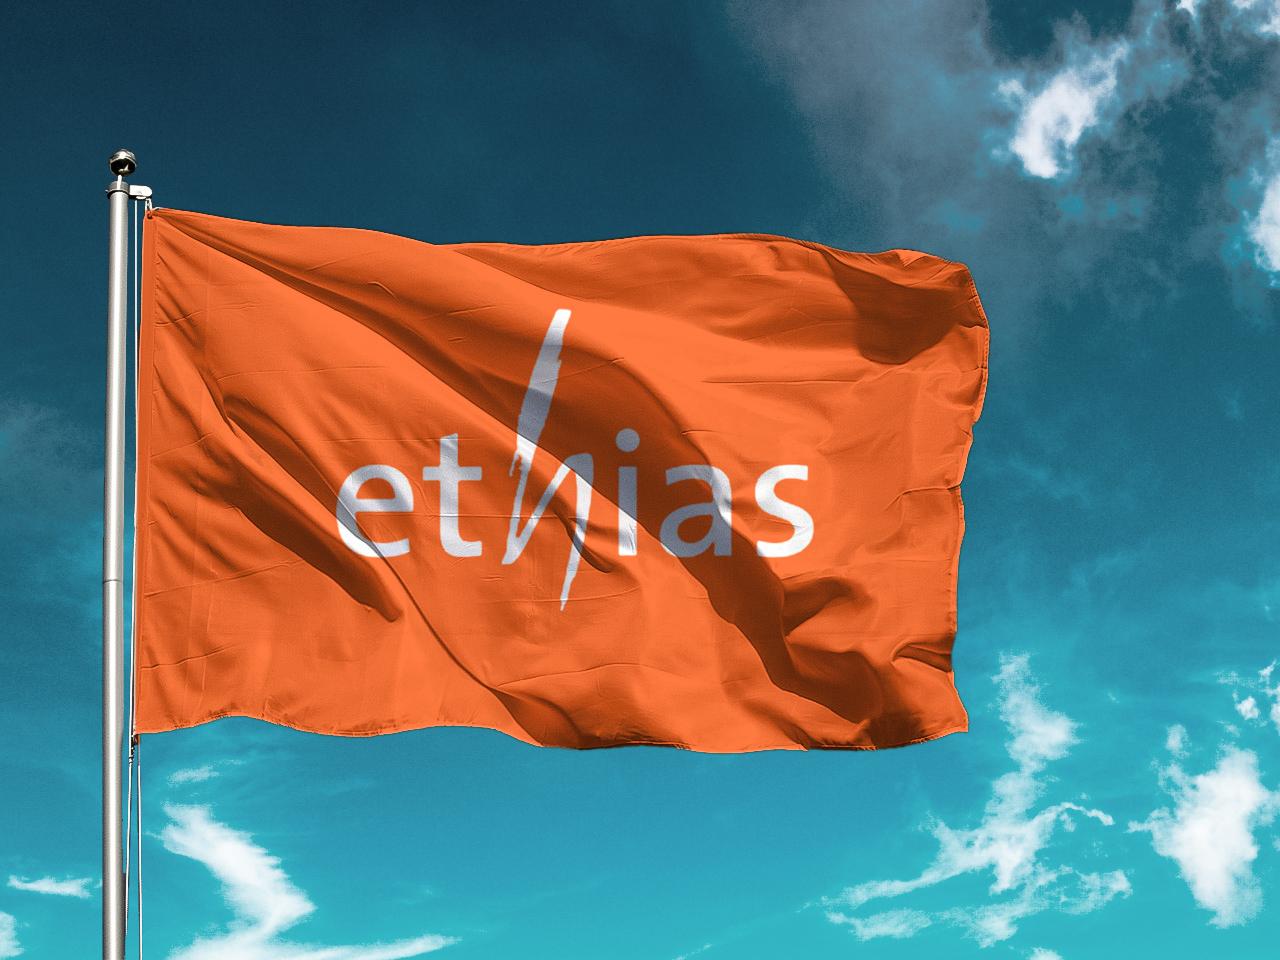 How to become a digital Insurance company | Ethias digital